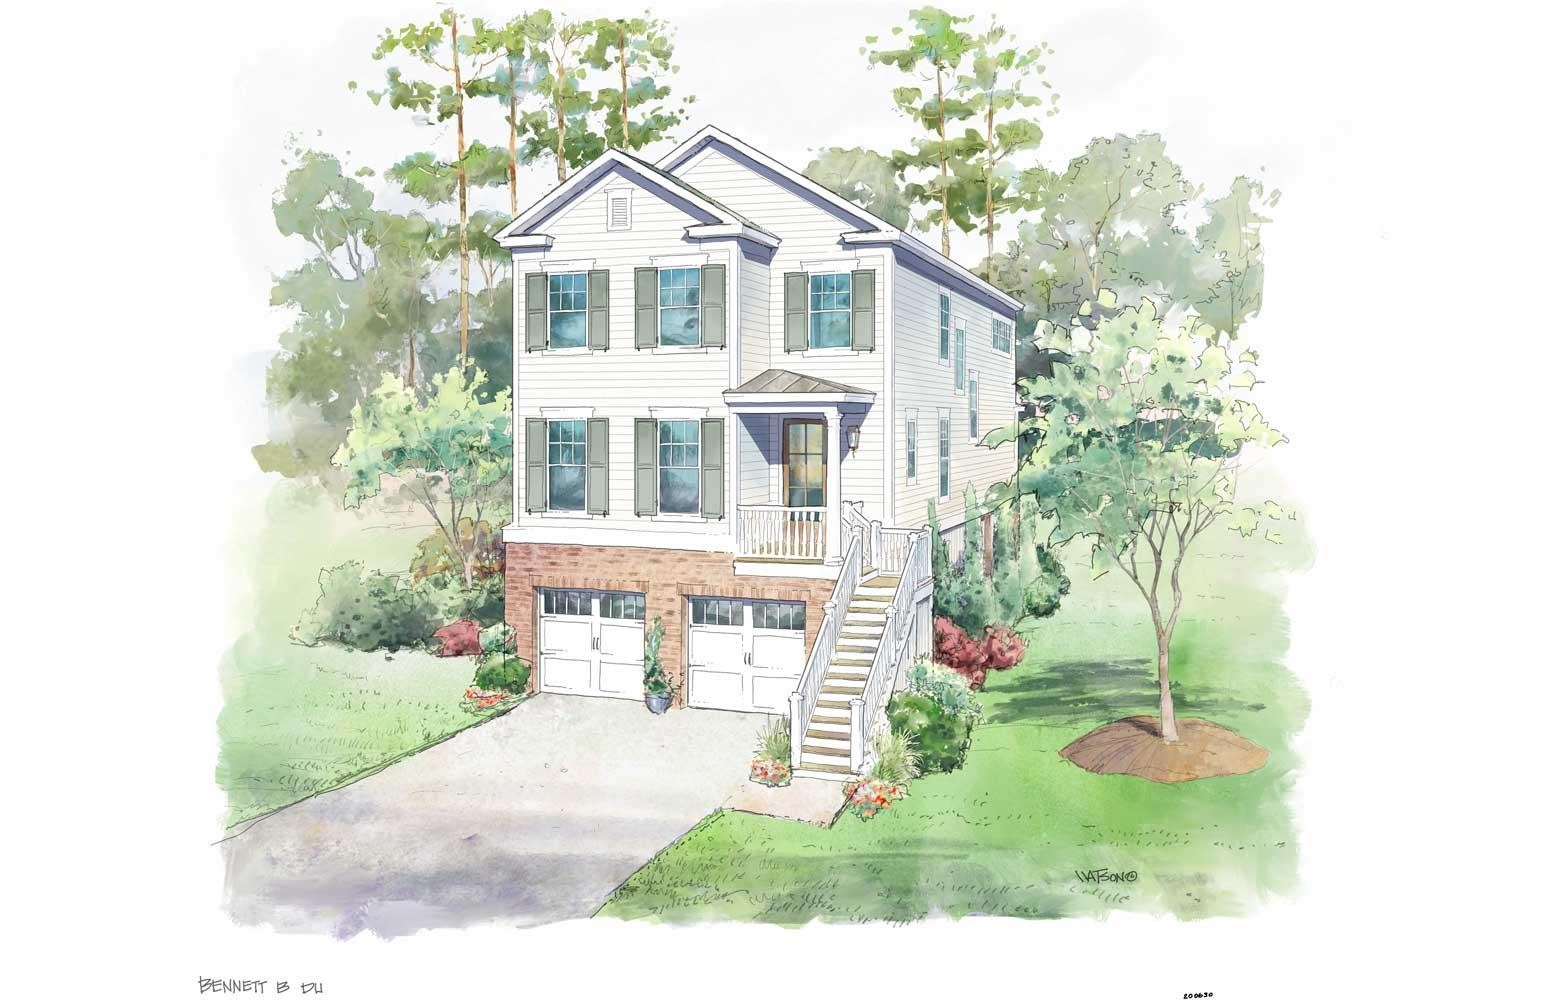 Avenue of Oaks Homes For Sale - 1101 Avenue Of Oaks, Charleston, SC - 0